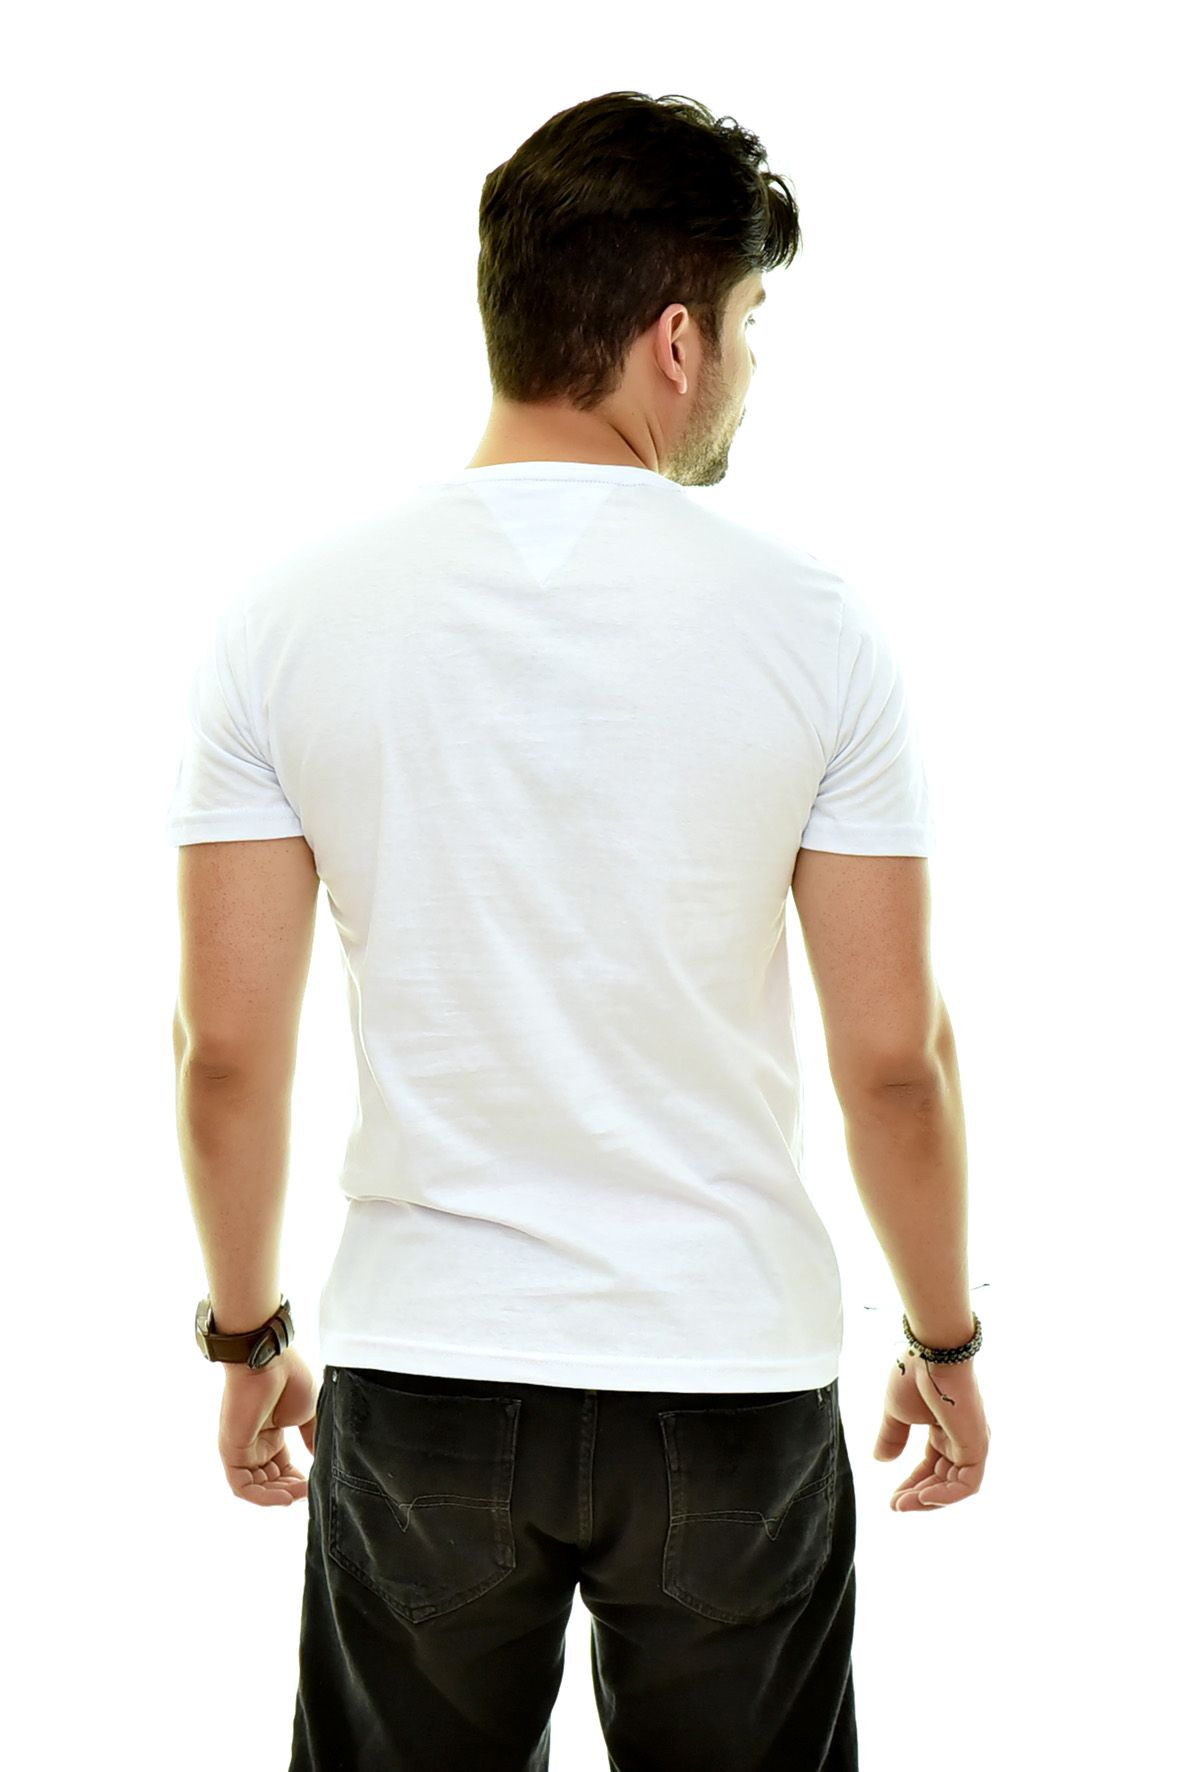 Camiseta TH Branca T2  - Ca Brasileira